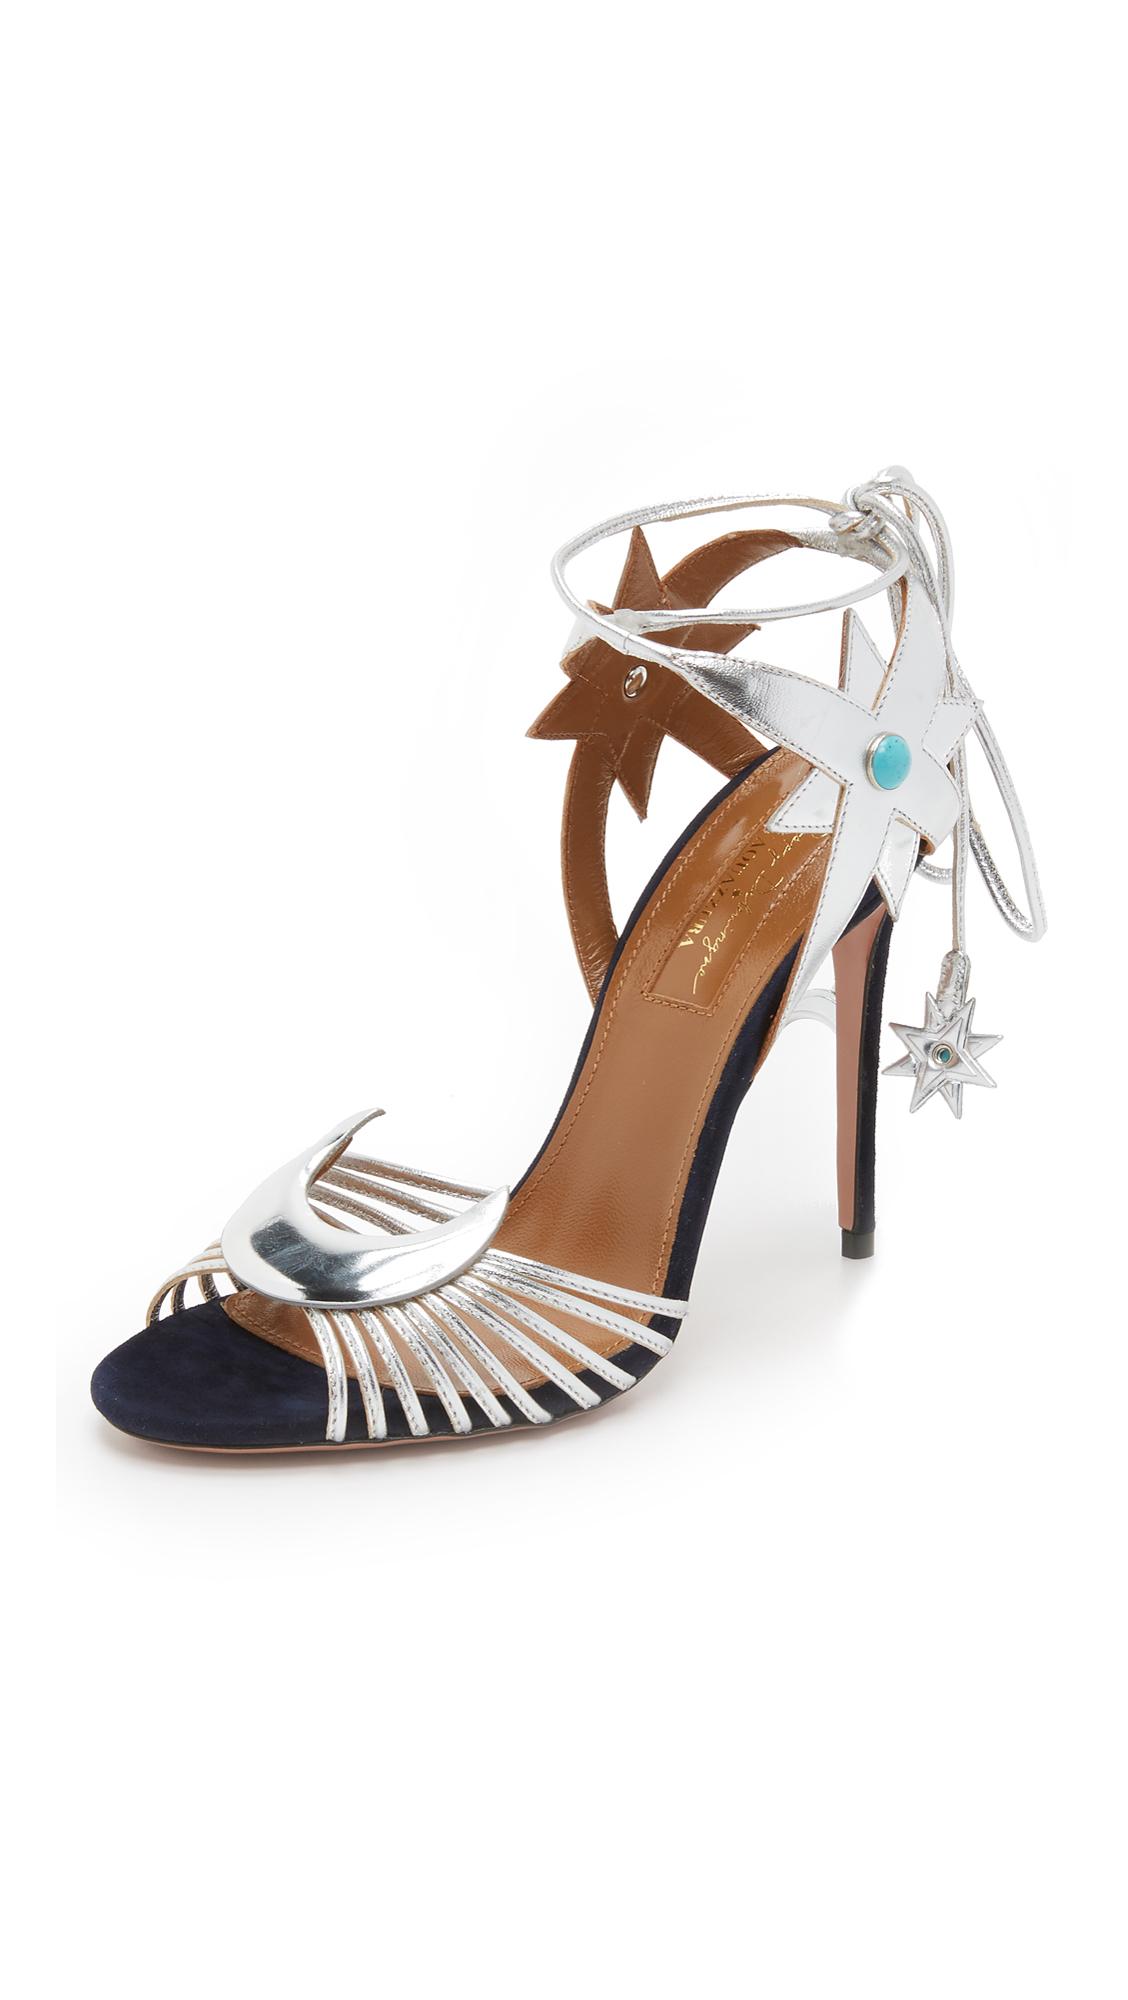 Black poppy sandals - Gallery